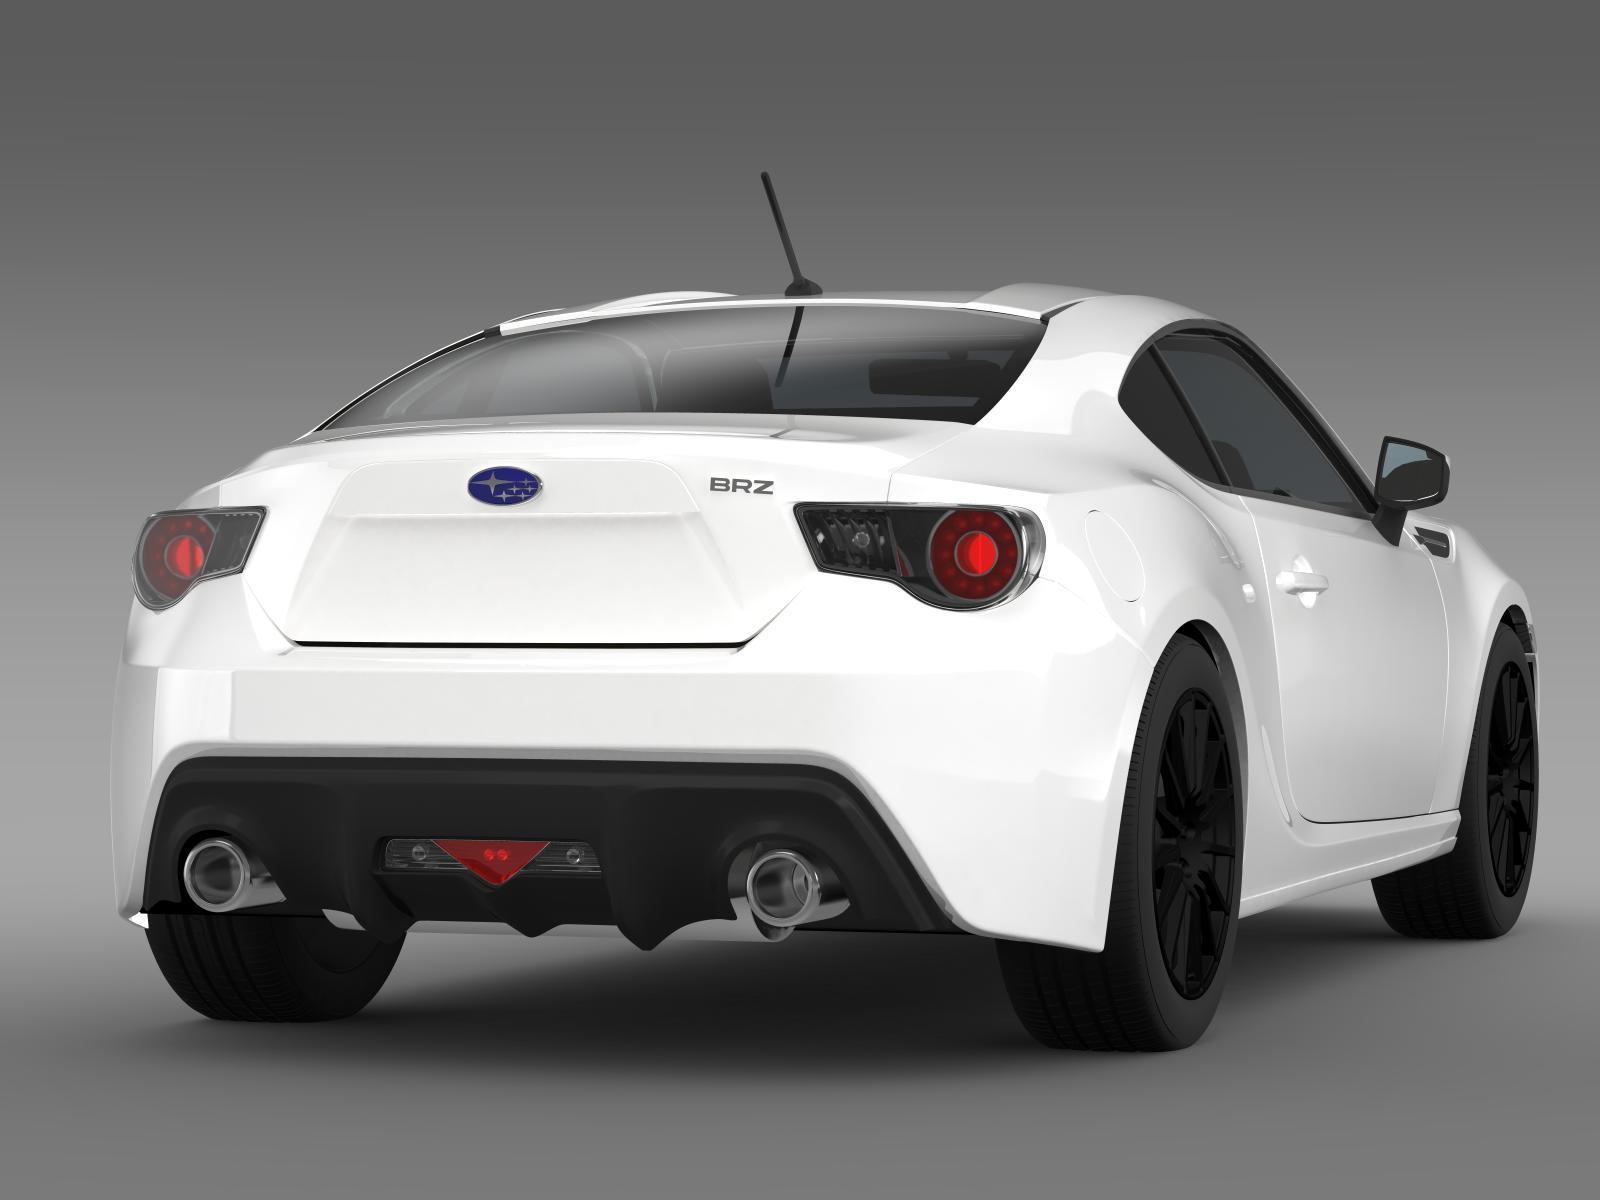 Subaru brz premium sport package zc6 2013 by creator3d 3docean subaru brz premium sport package zc6 2013 9g vanachro Gallery